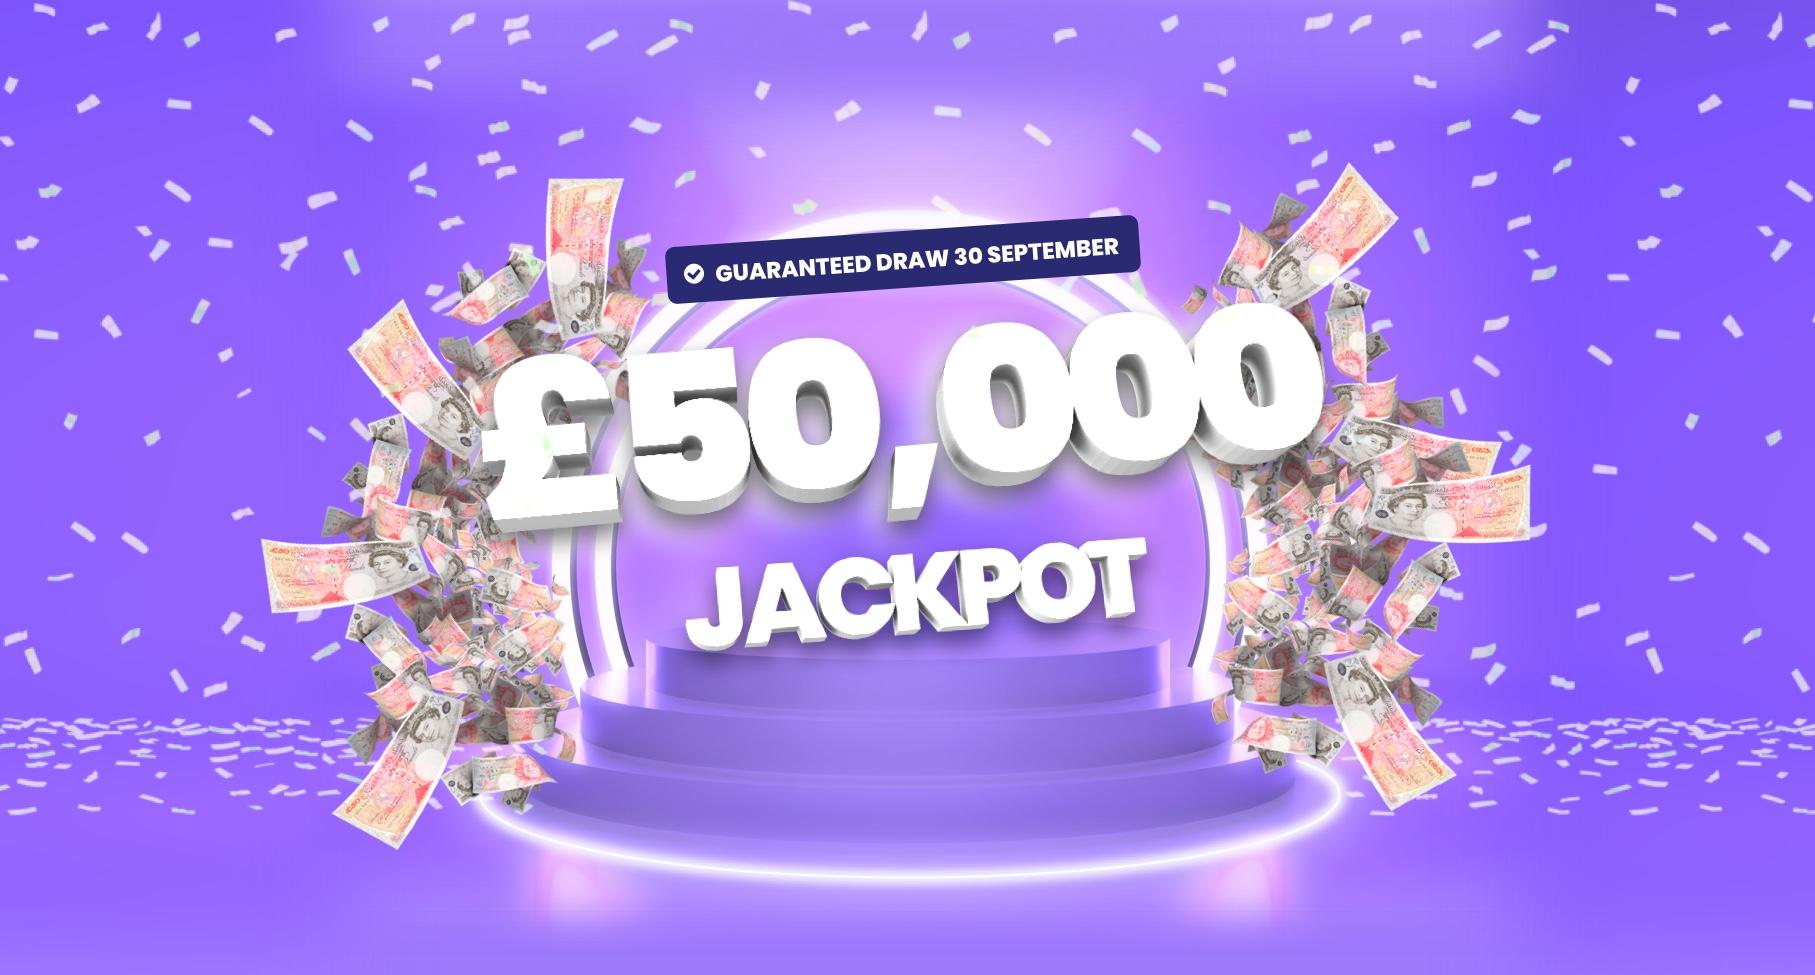 The Raffolux 50K Jackpot